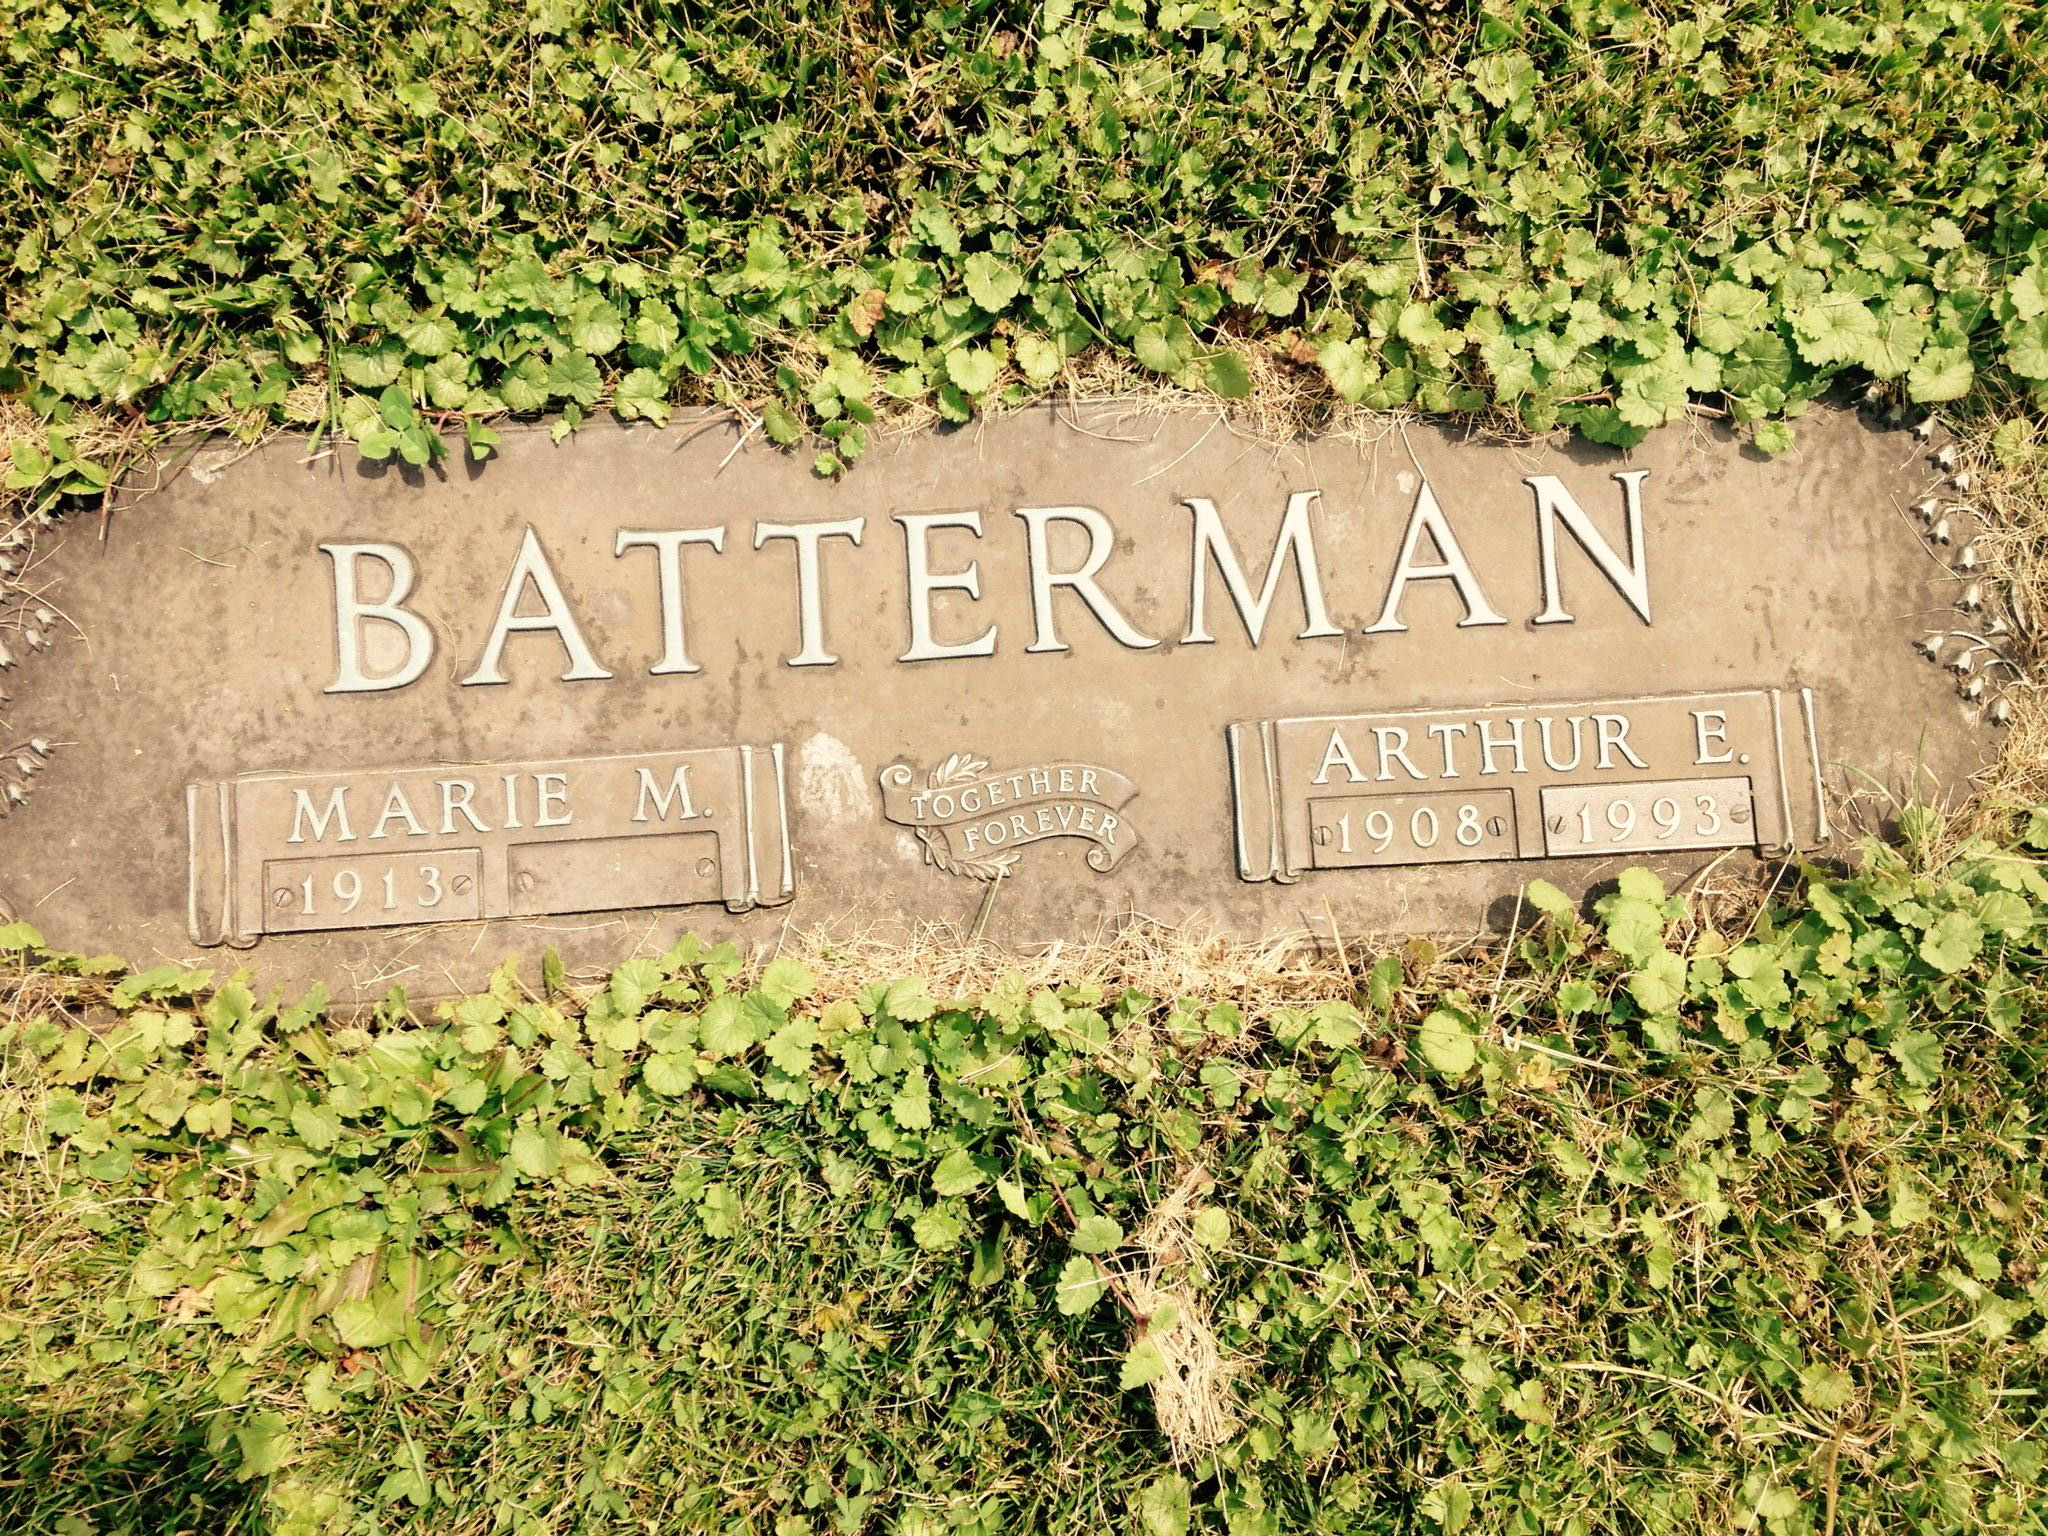 Arthur E. Batterman